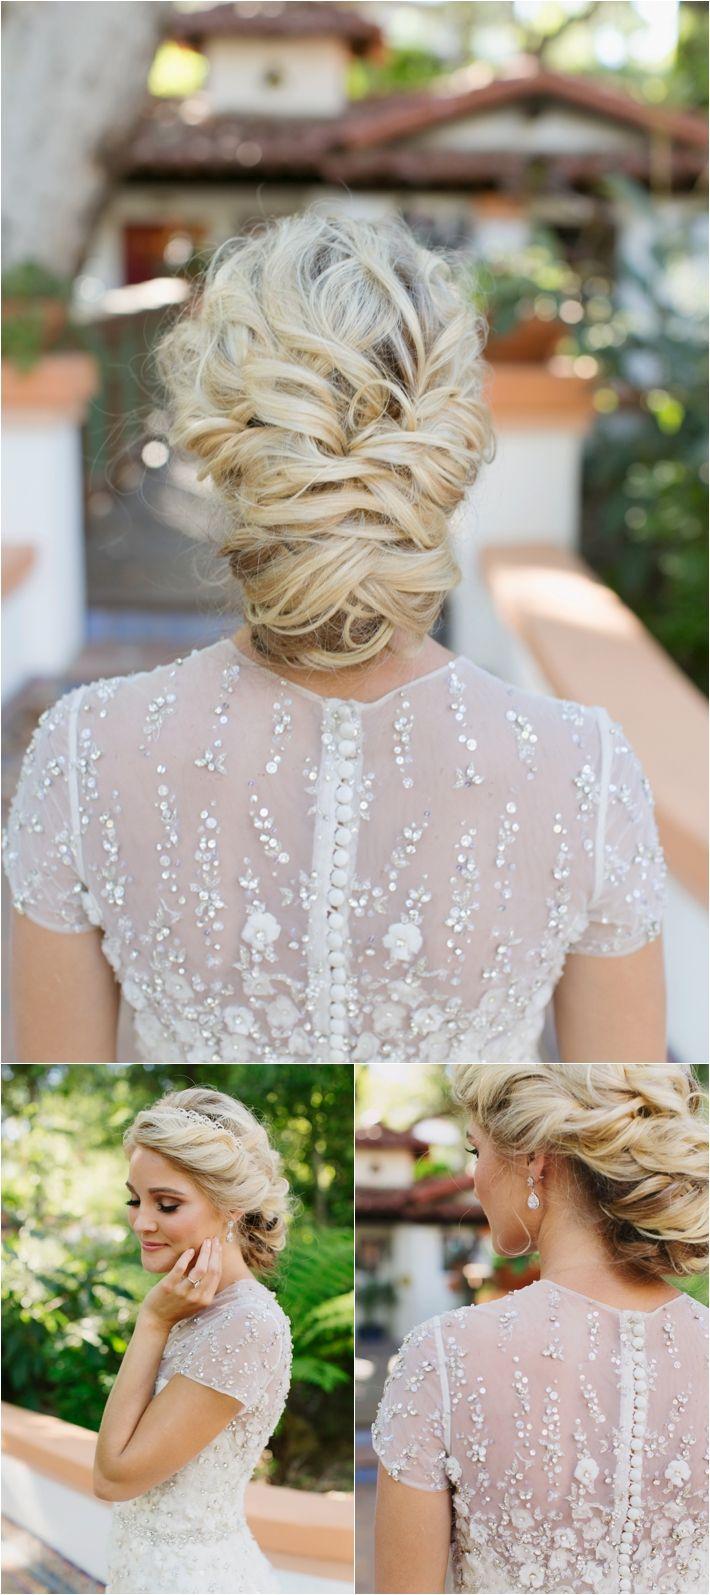 Best & Top 9 Braided Hairstyles for Wedding Bridals 2016-2017 (8)